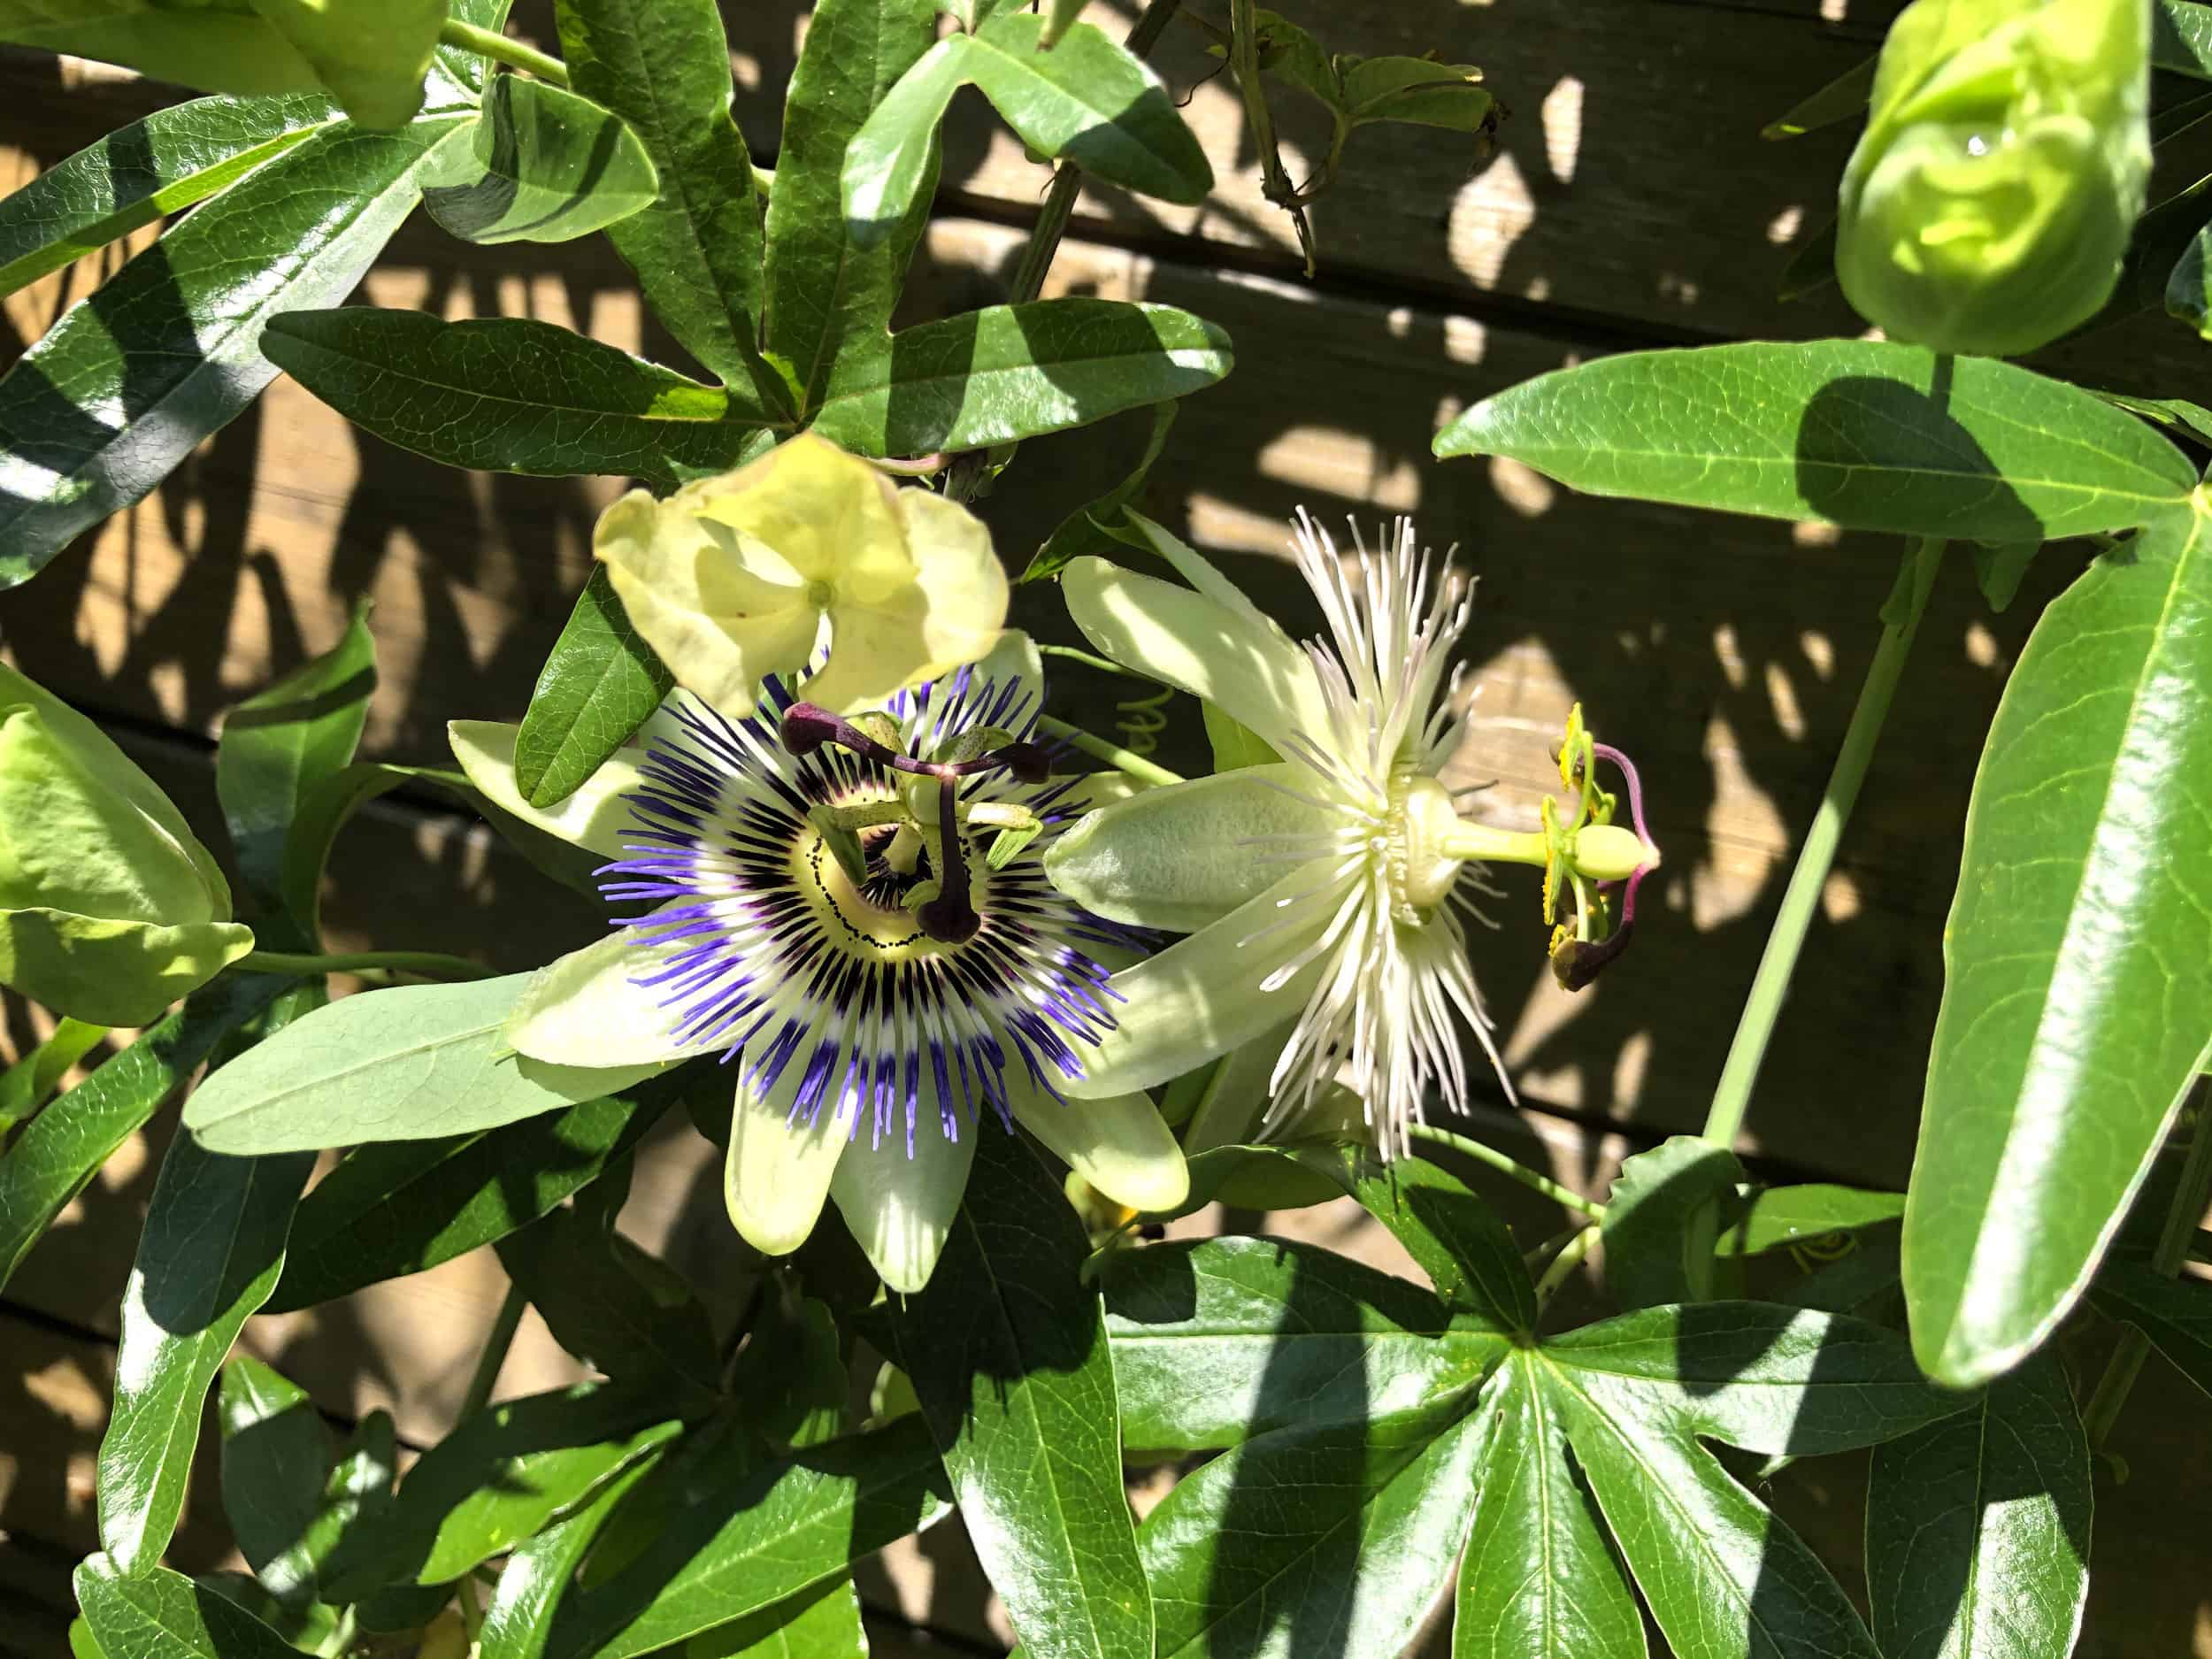 20-06-Passiflora caerula 'Constance Elliot' 01